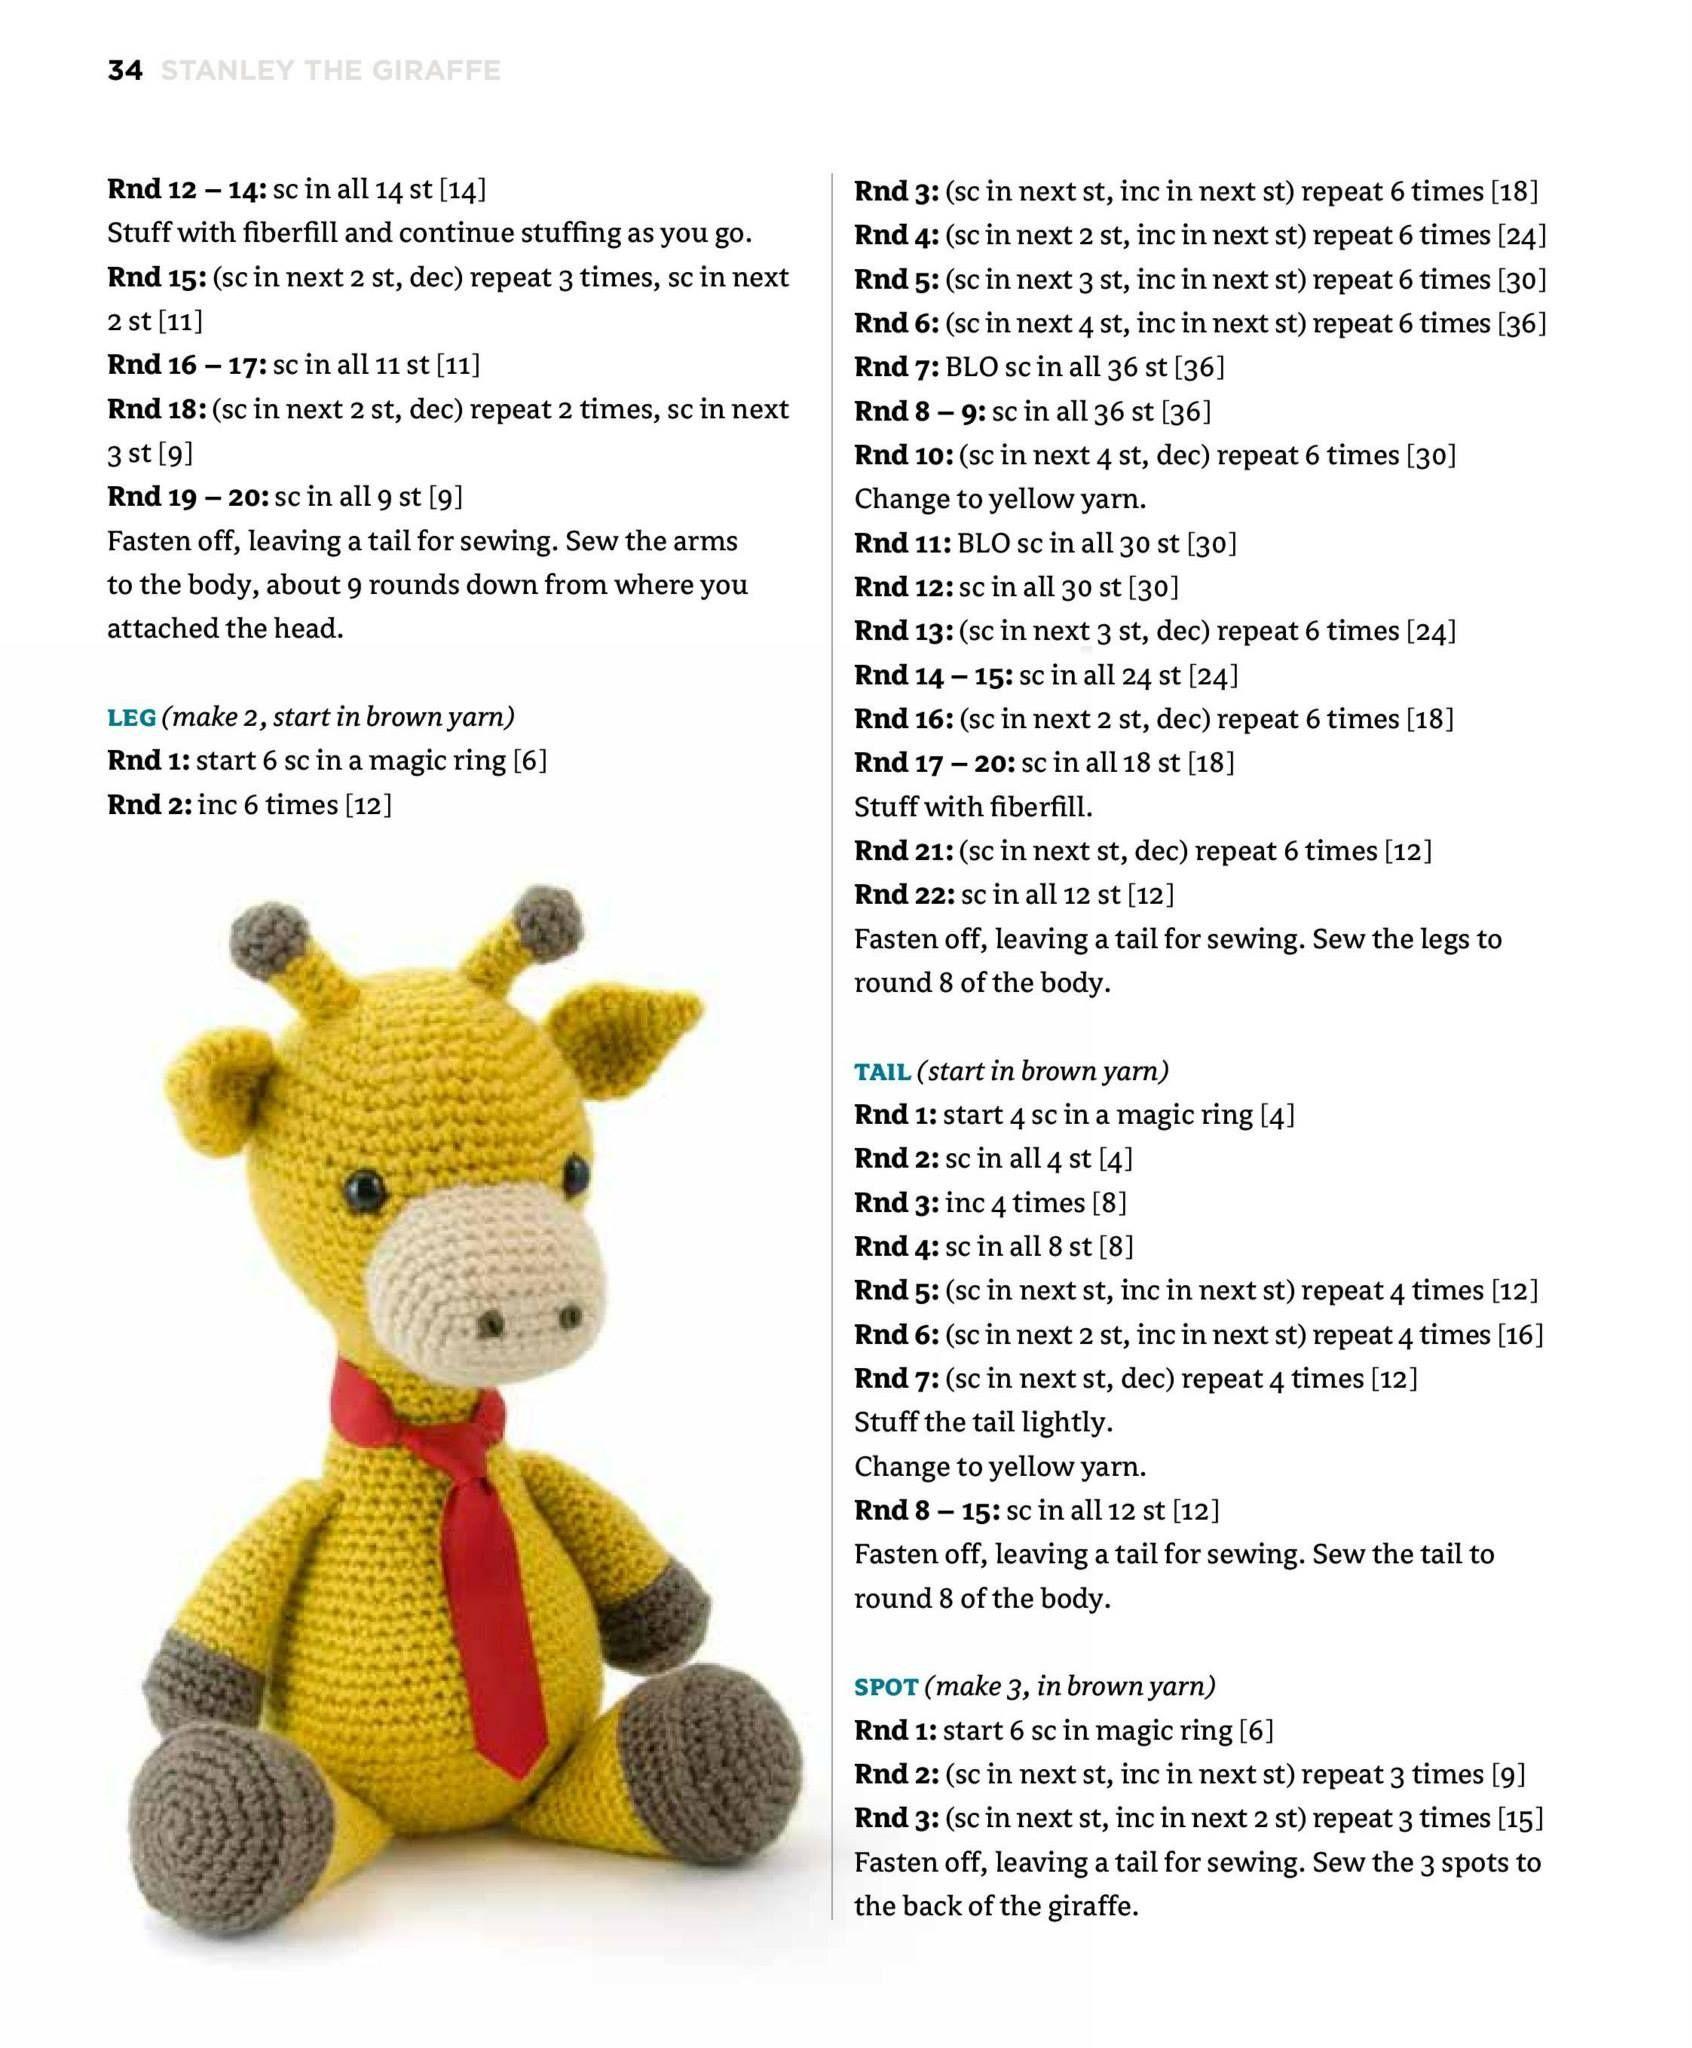 Giraffe Crochet Amigurumi Pattern. how to crochet a giraffe ... | 2048x1692